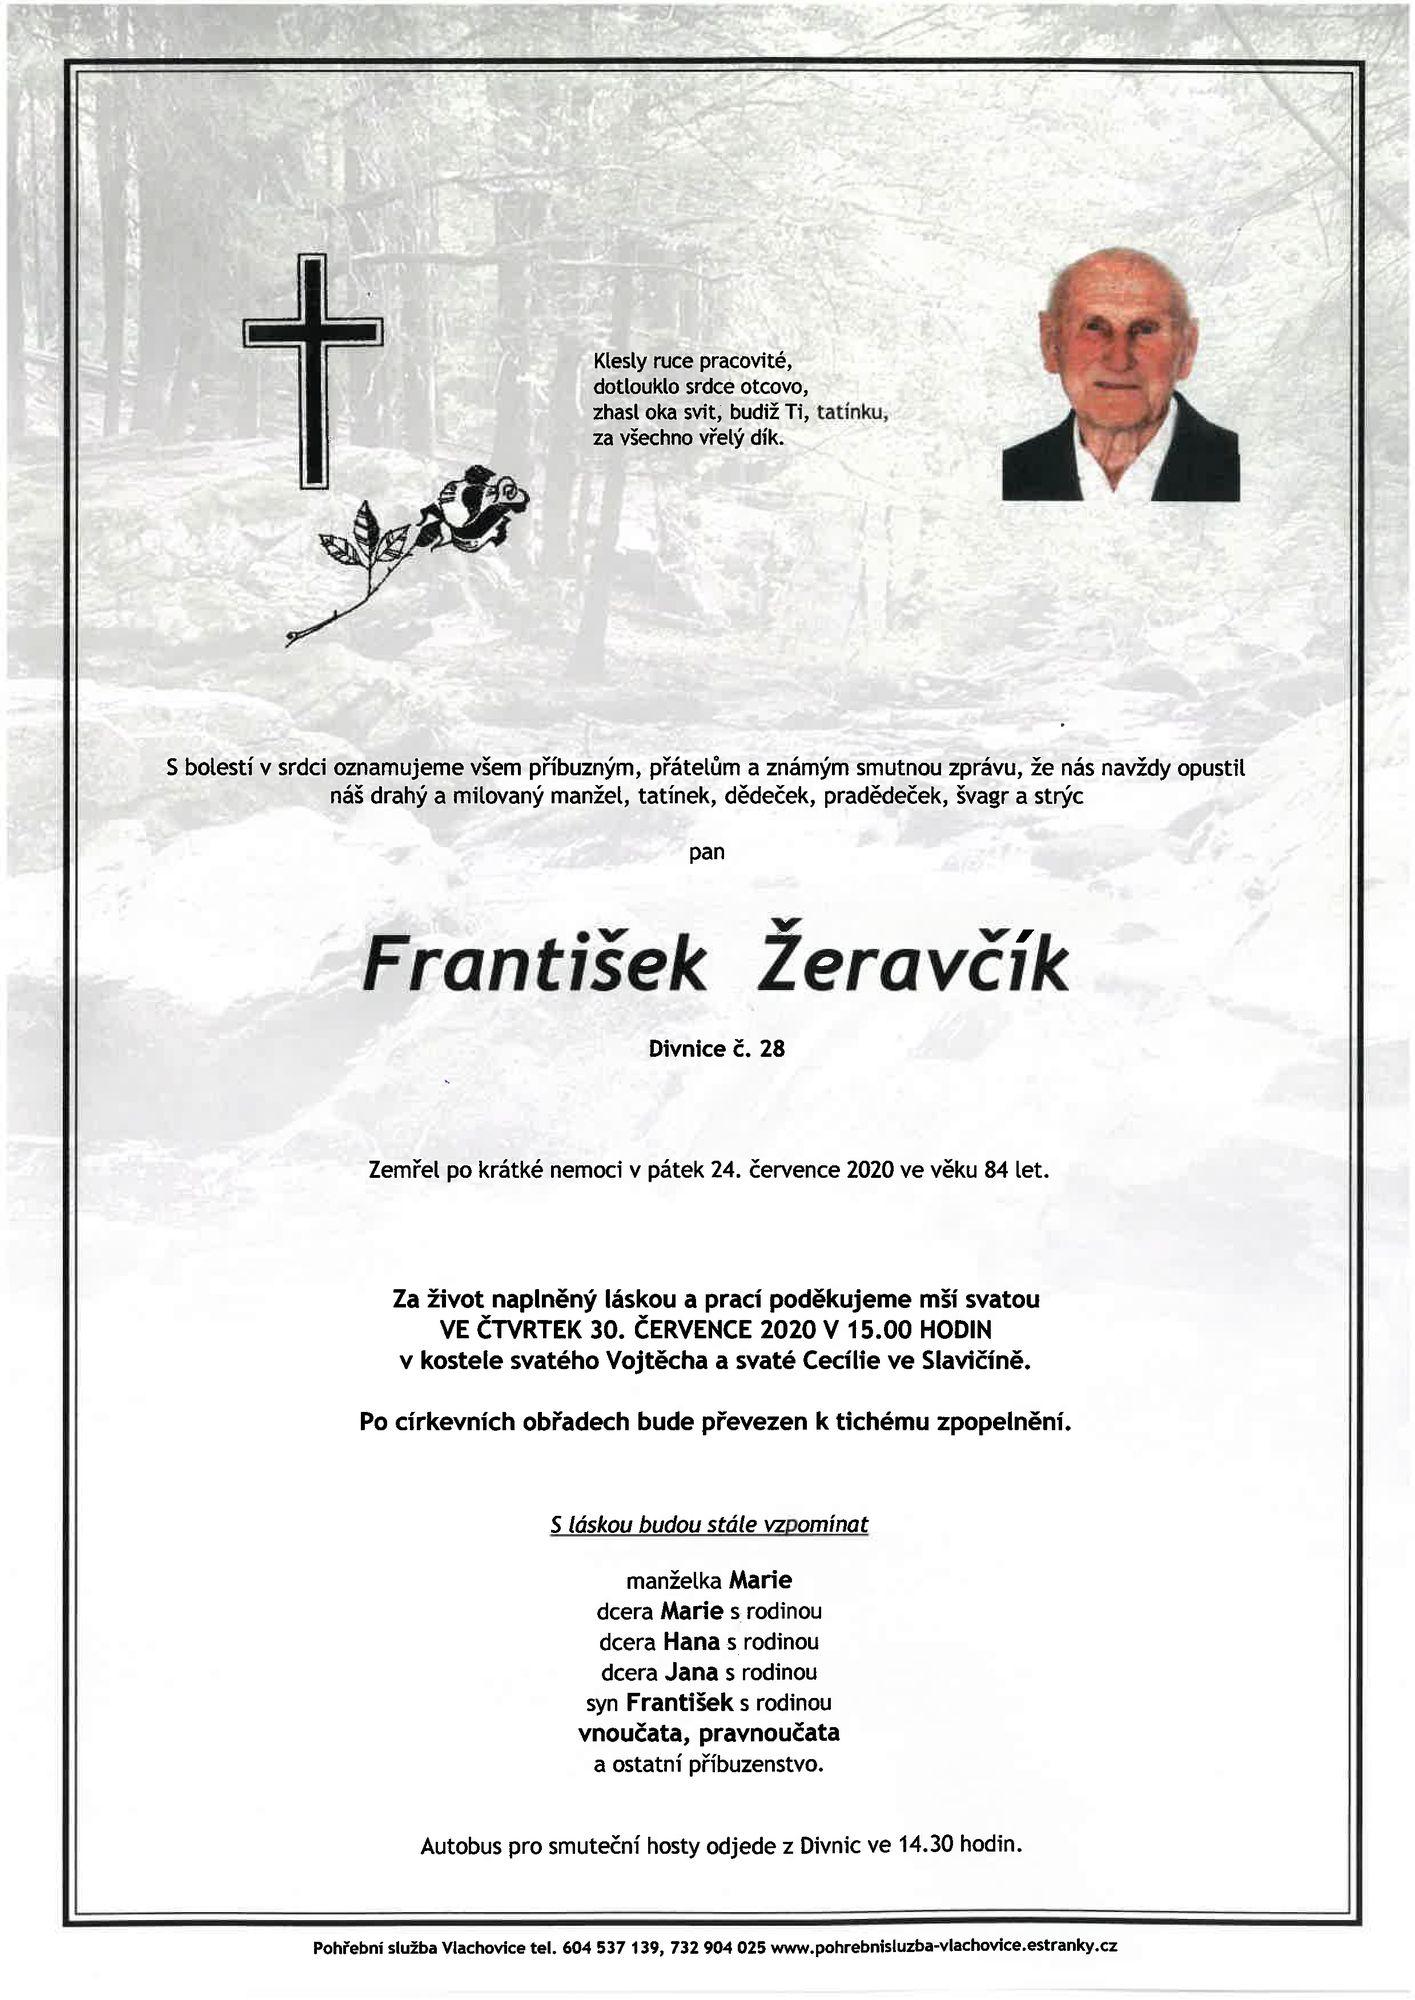 František Žeravčík